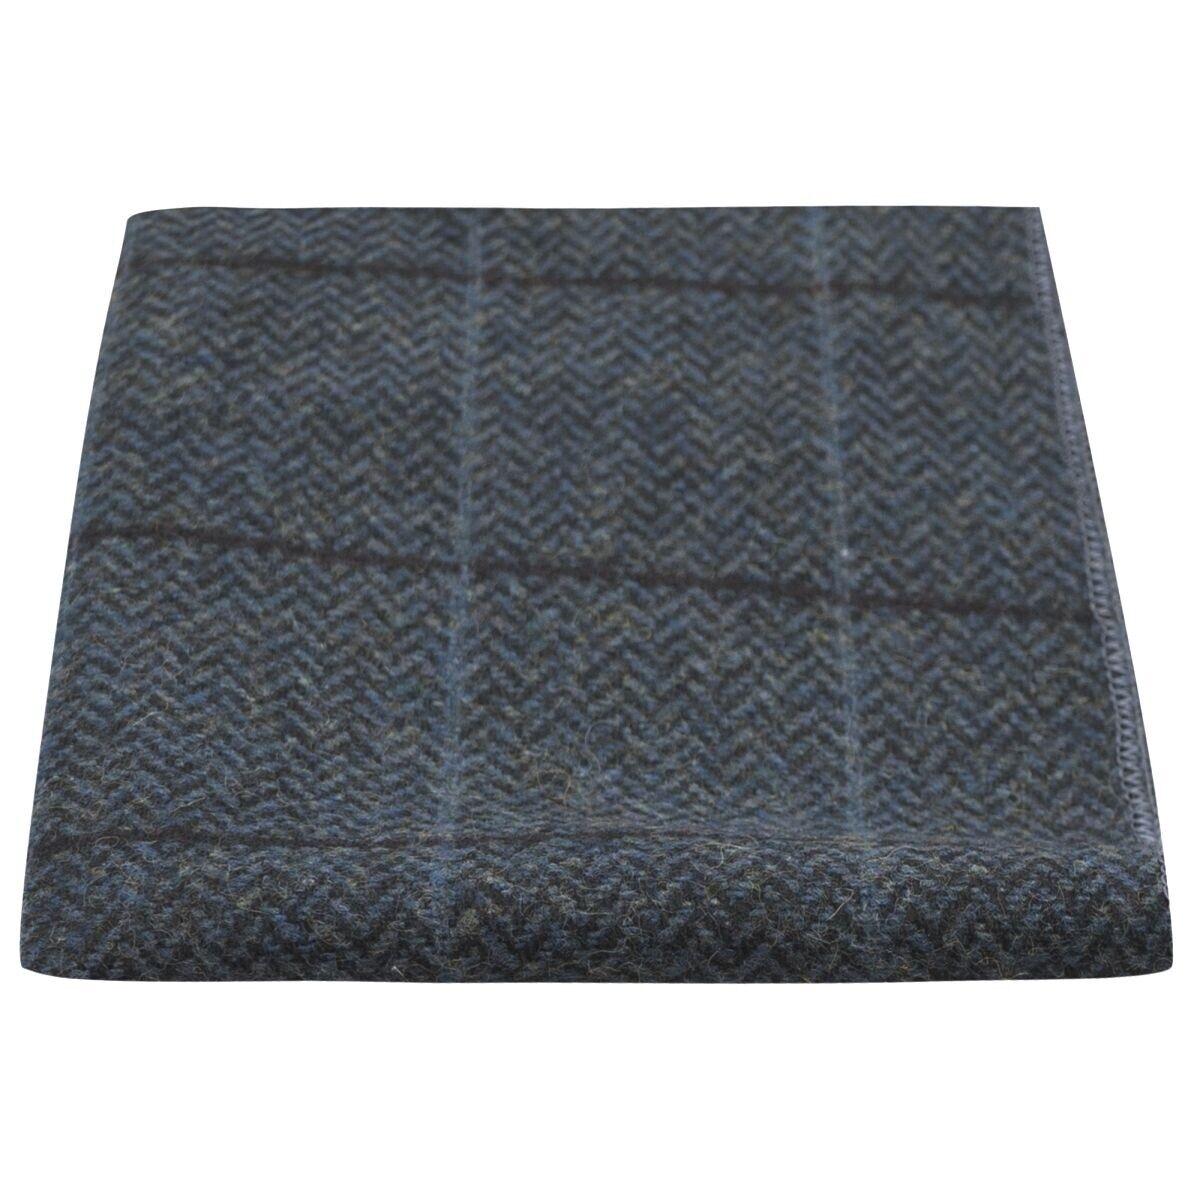 Luxury Aegean Blue Herringbone Check Pocket Square, Handkerchief, Tweed